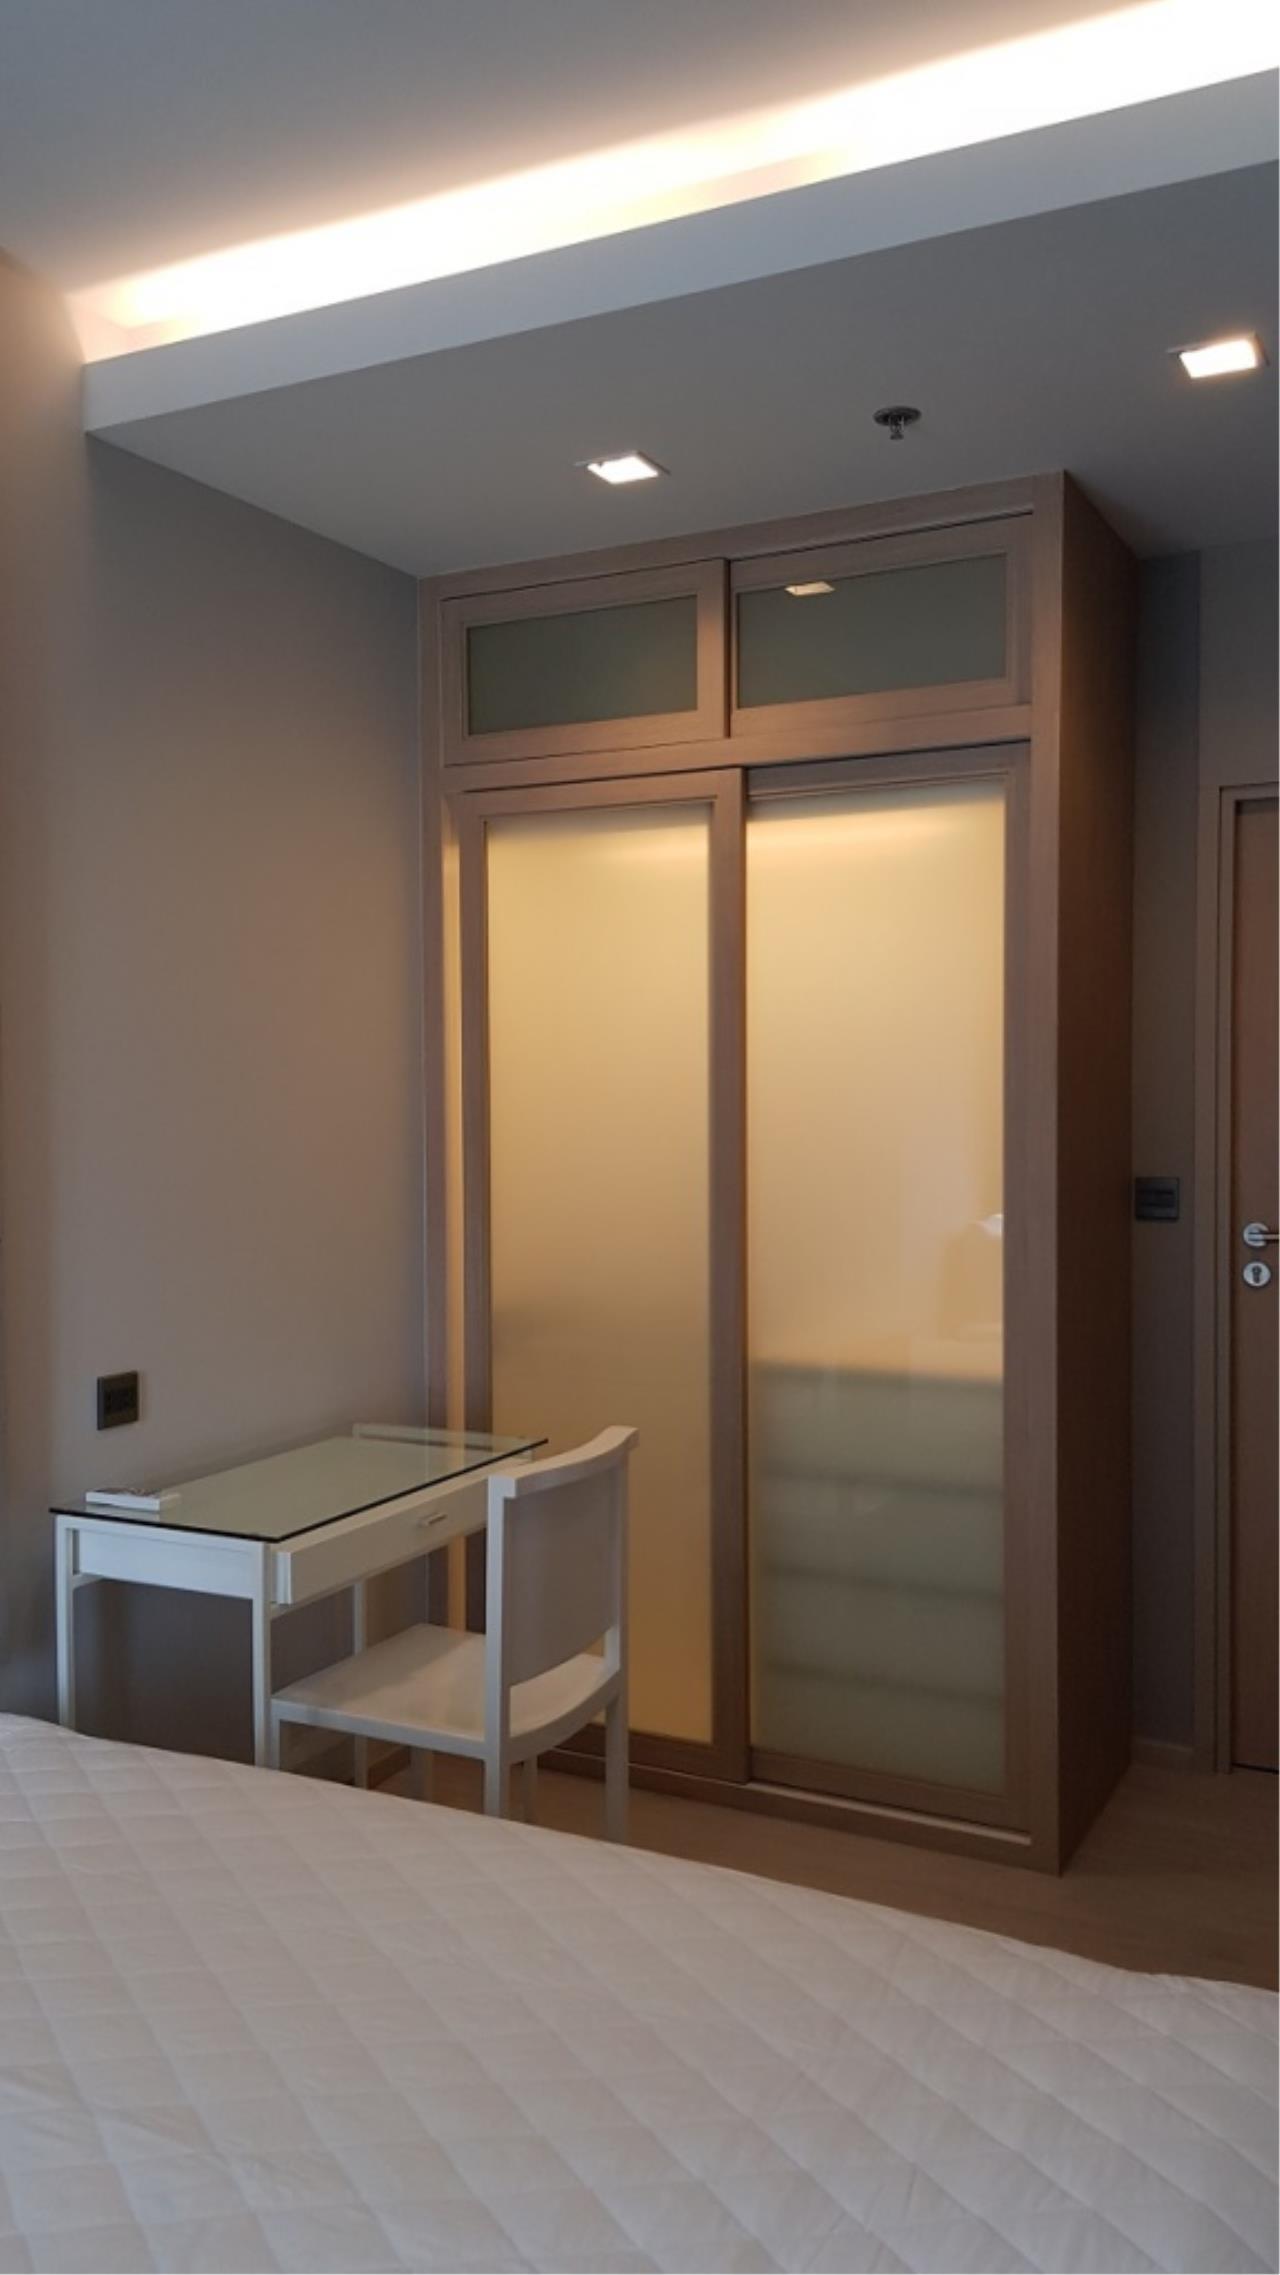 Century21 Skylux Agency's M Thonglor 10 / Condo For Rent / 1 Bedroom / 32 SQM / BTS Thong Lo / Bangkok 5